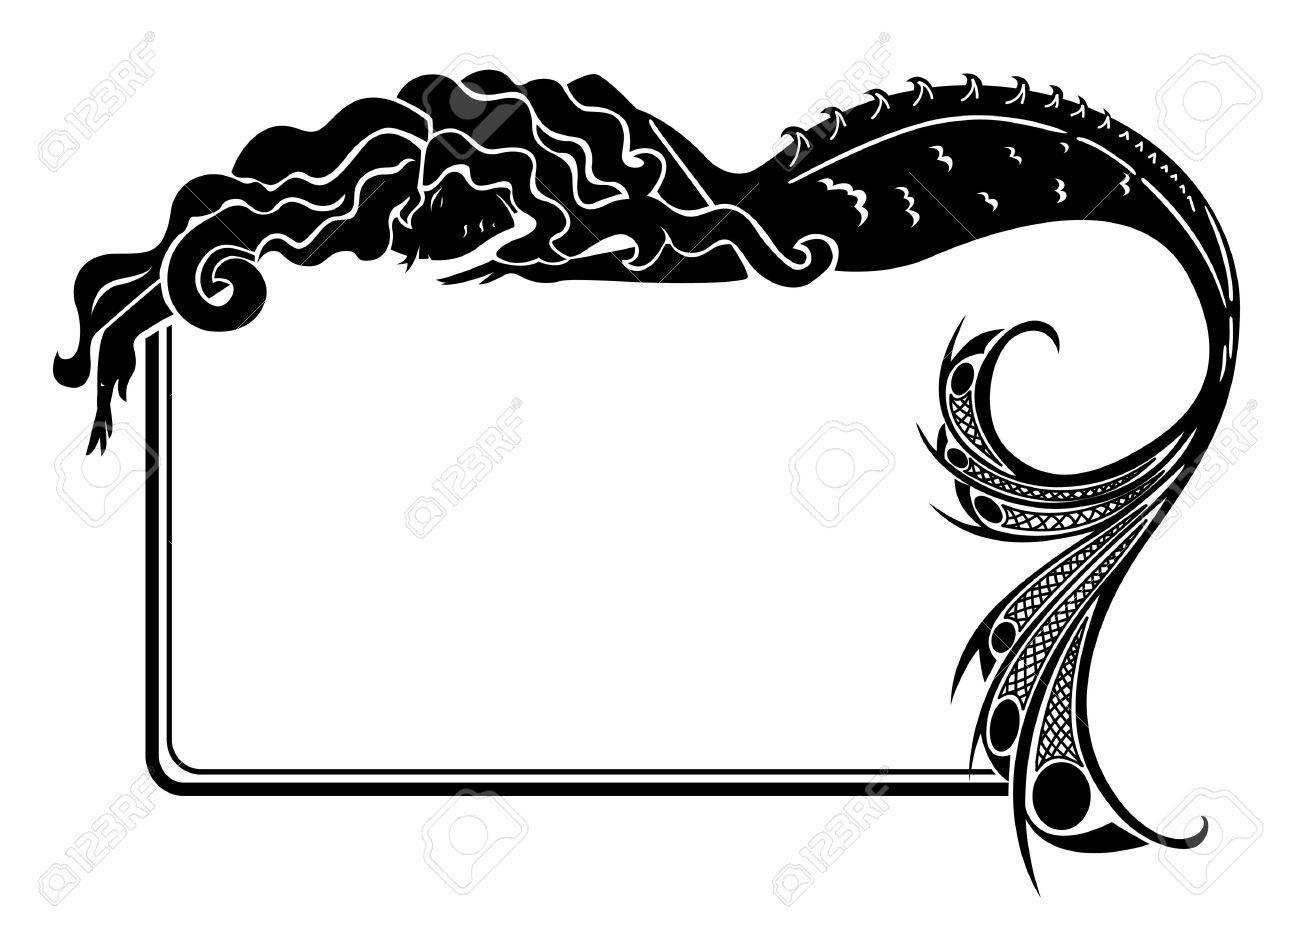 Mermaid Silhouette Stock Vector Illustration And Royalty Free Mermaid Silhouette Clipart Clip Art Silhouette Frames Mermaid Silhouette